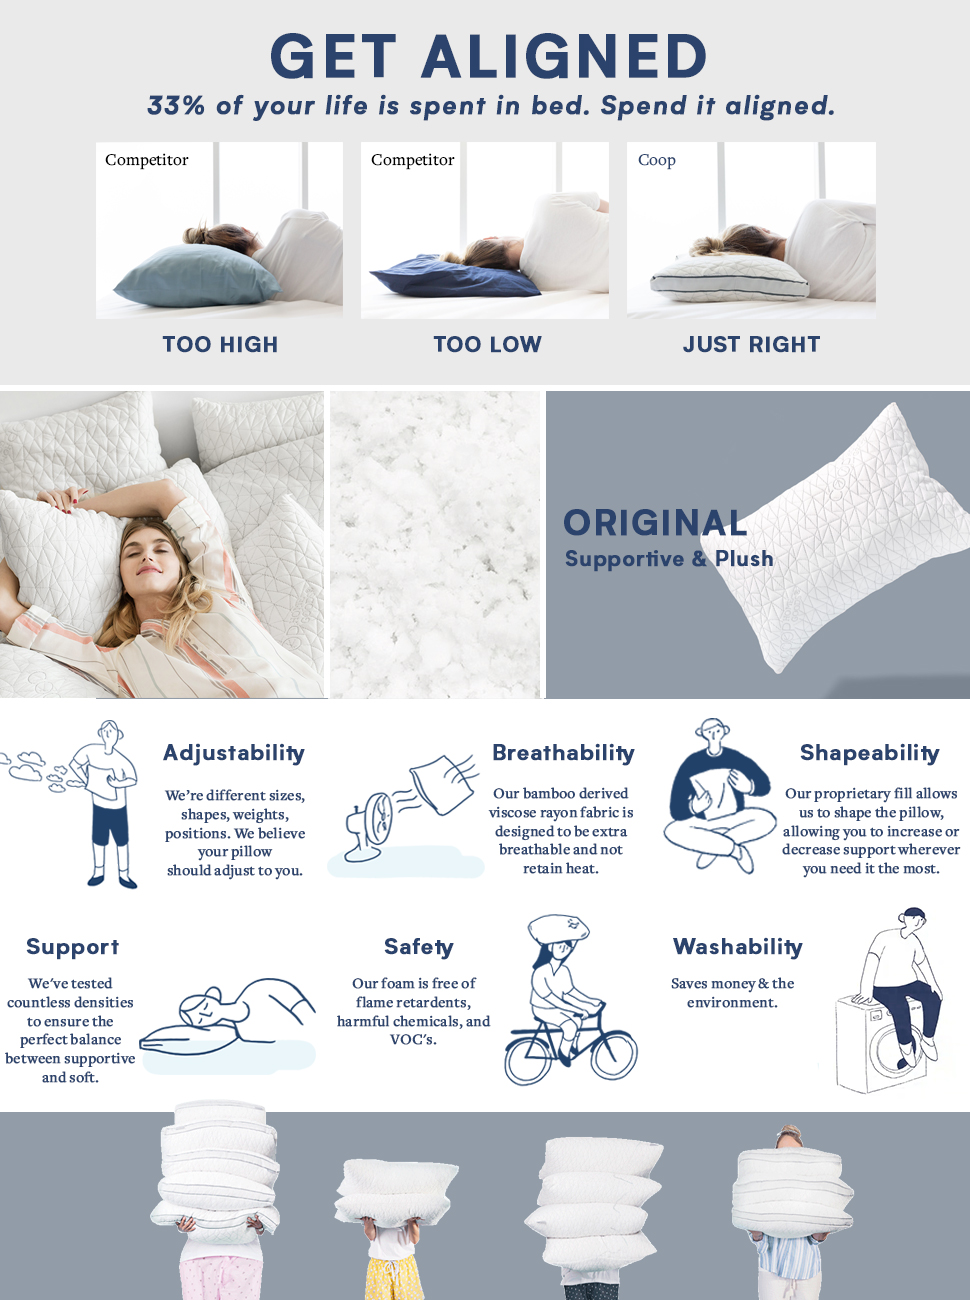 Coop Home Goods Premium Adjustable Loft Shredded